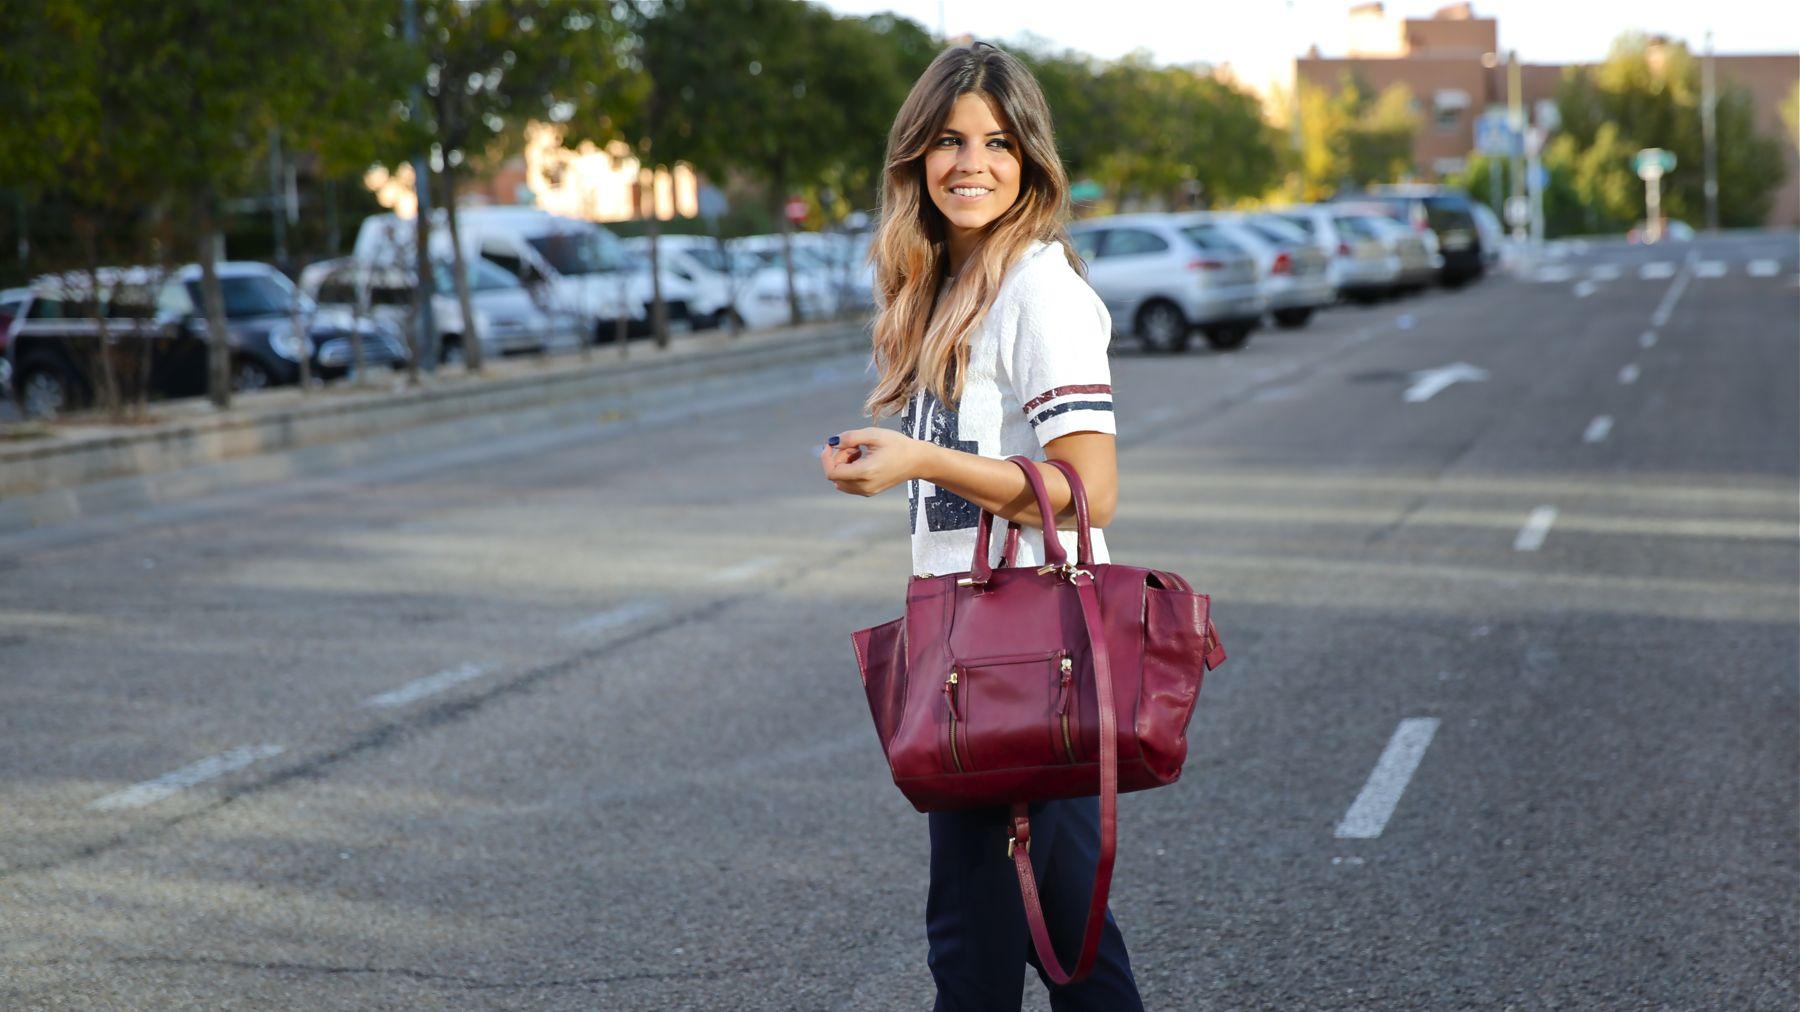 trendy_taste-look-outfit-street_style-ootd-blog-blogger-fashion_spain-moda_españa-zara-stan_smith-adidas-cosette-tee-baseball-camiseta-numero-pantalón-capri-pinzas-14